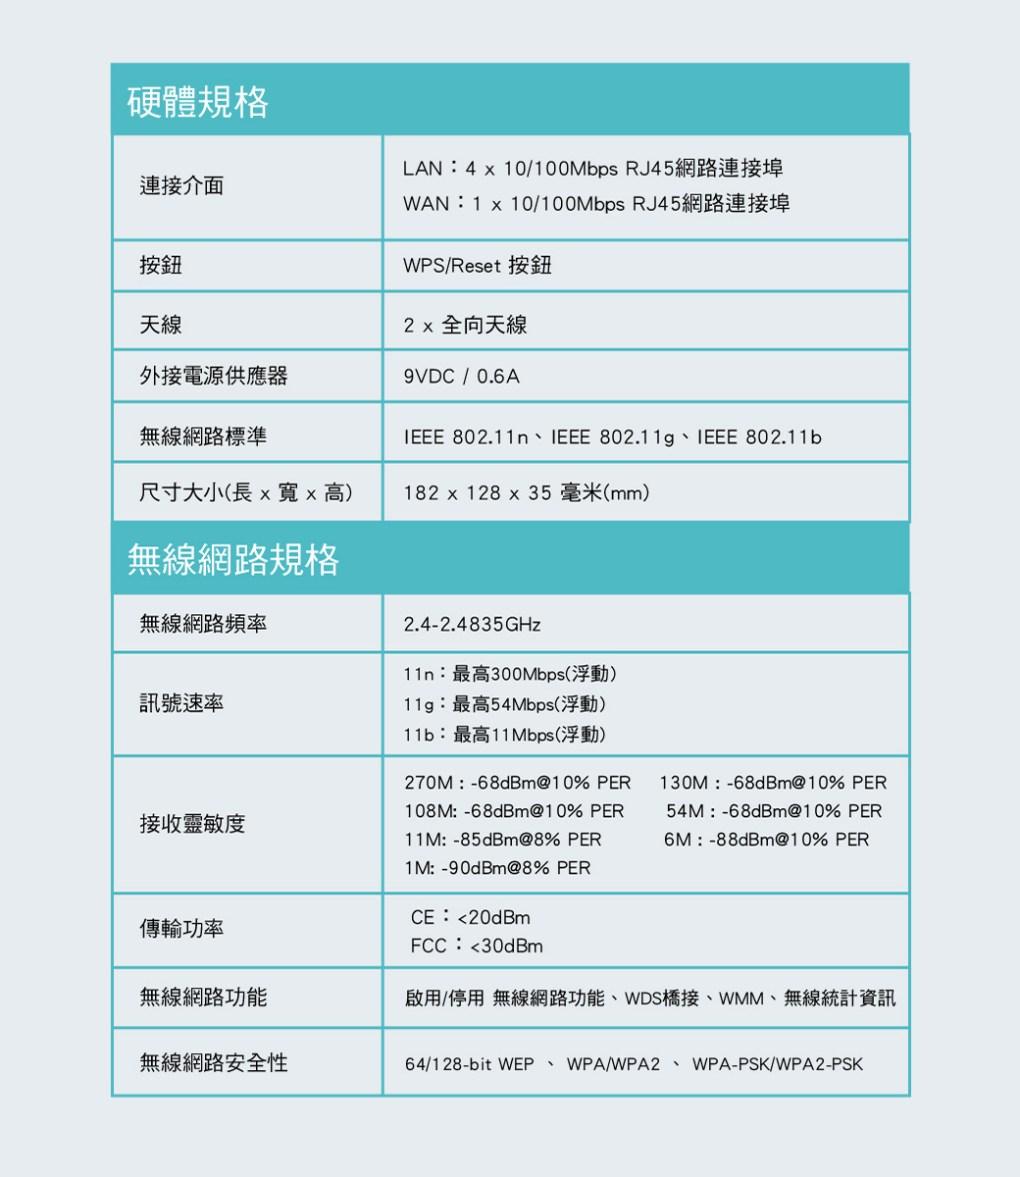 TP-Link TL-WR840N 300Mbps 無線網路 WiFi 路由器(分享器) - TP Link TL WR840N 14